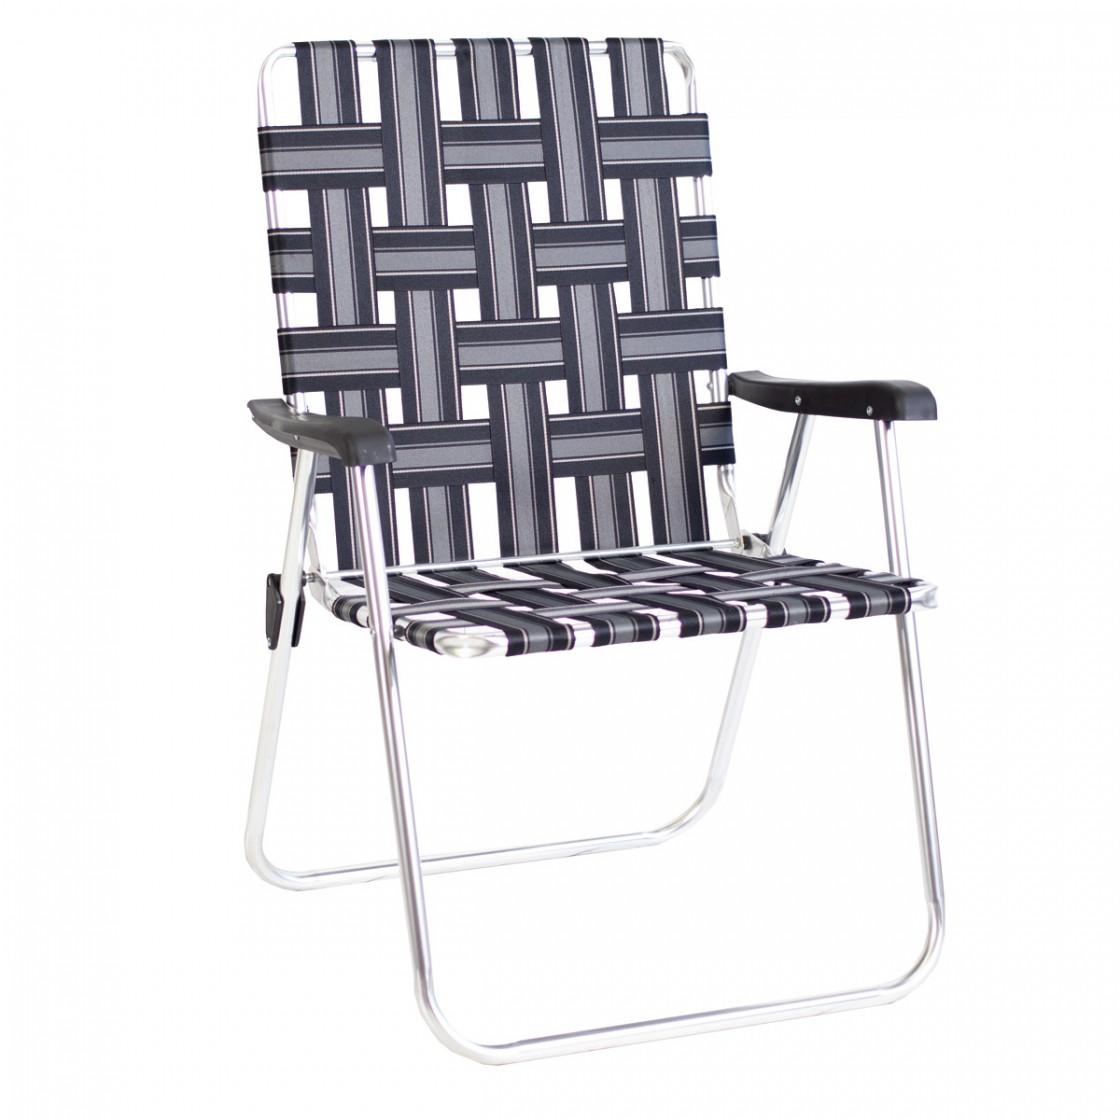 kuma 830 backtrack chair HYDE black black